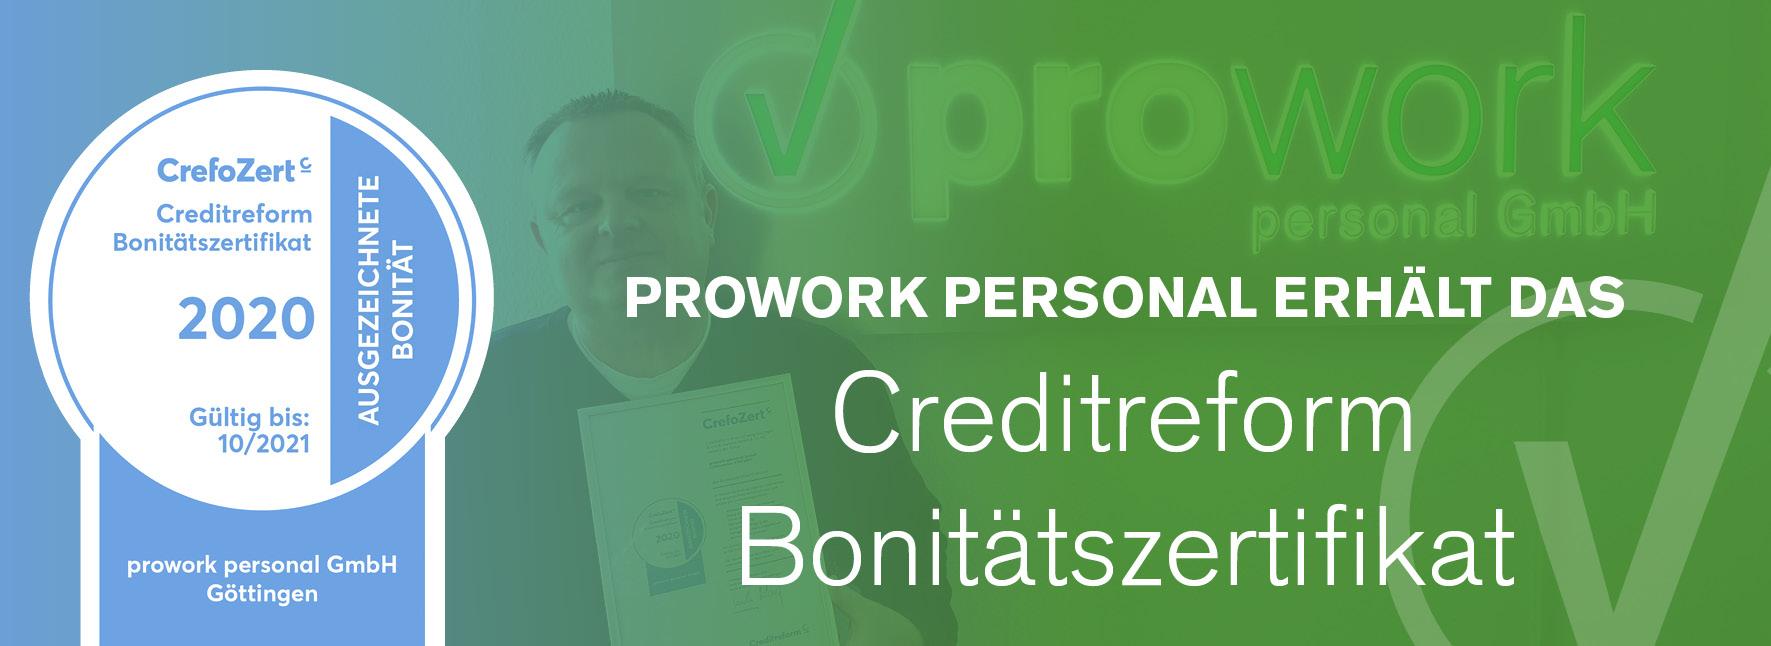 prowork personal erhält erneut das Creditreform Bonitätszertifikat